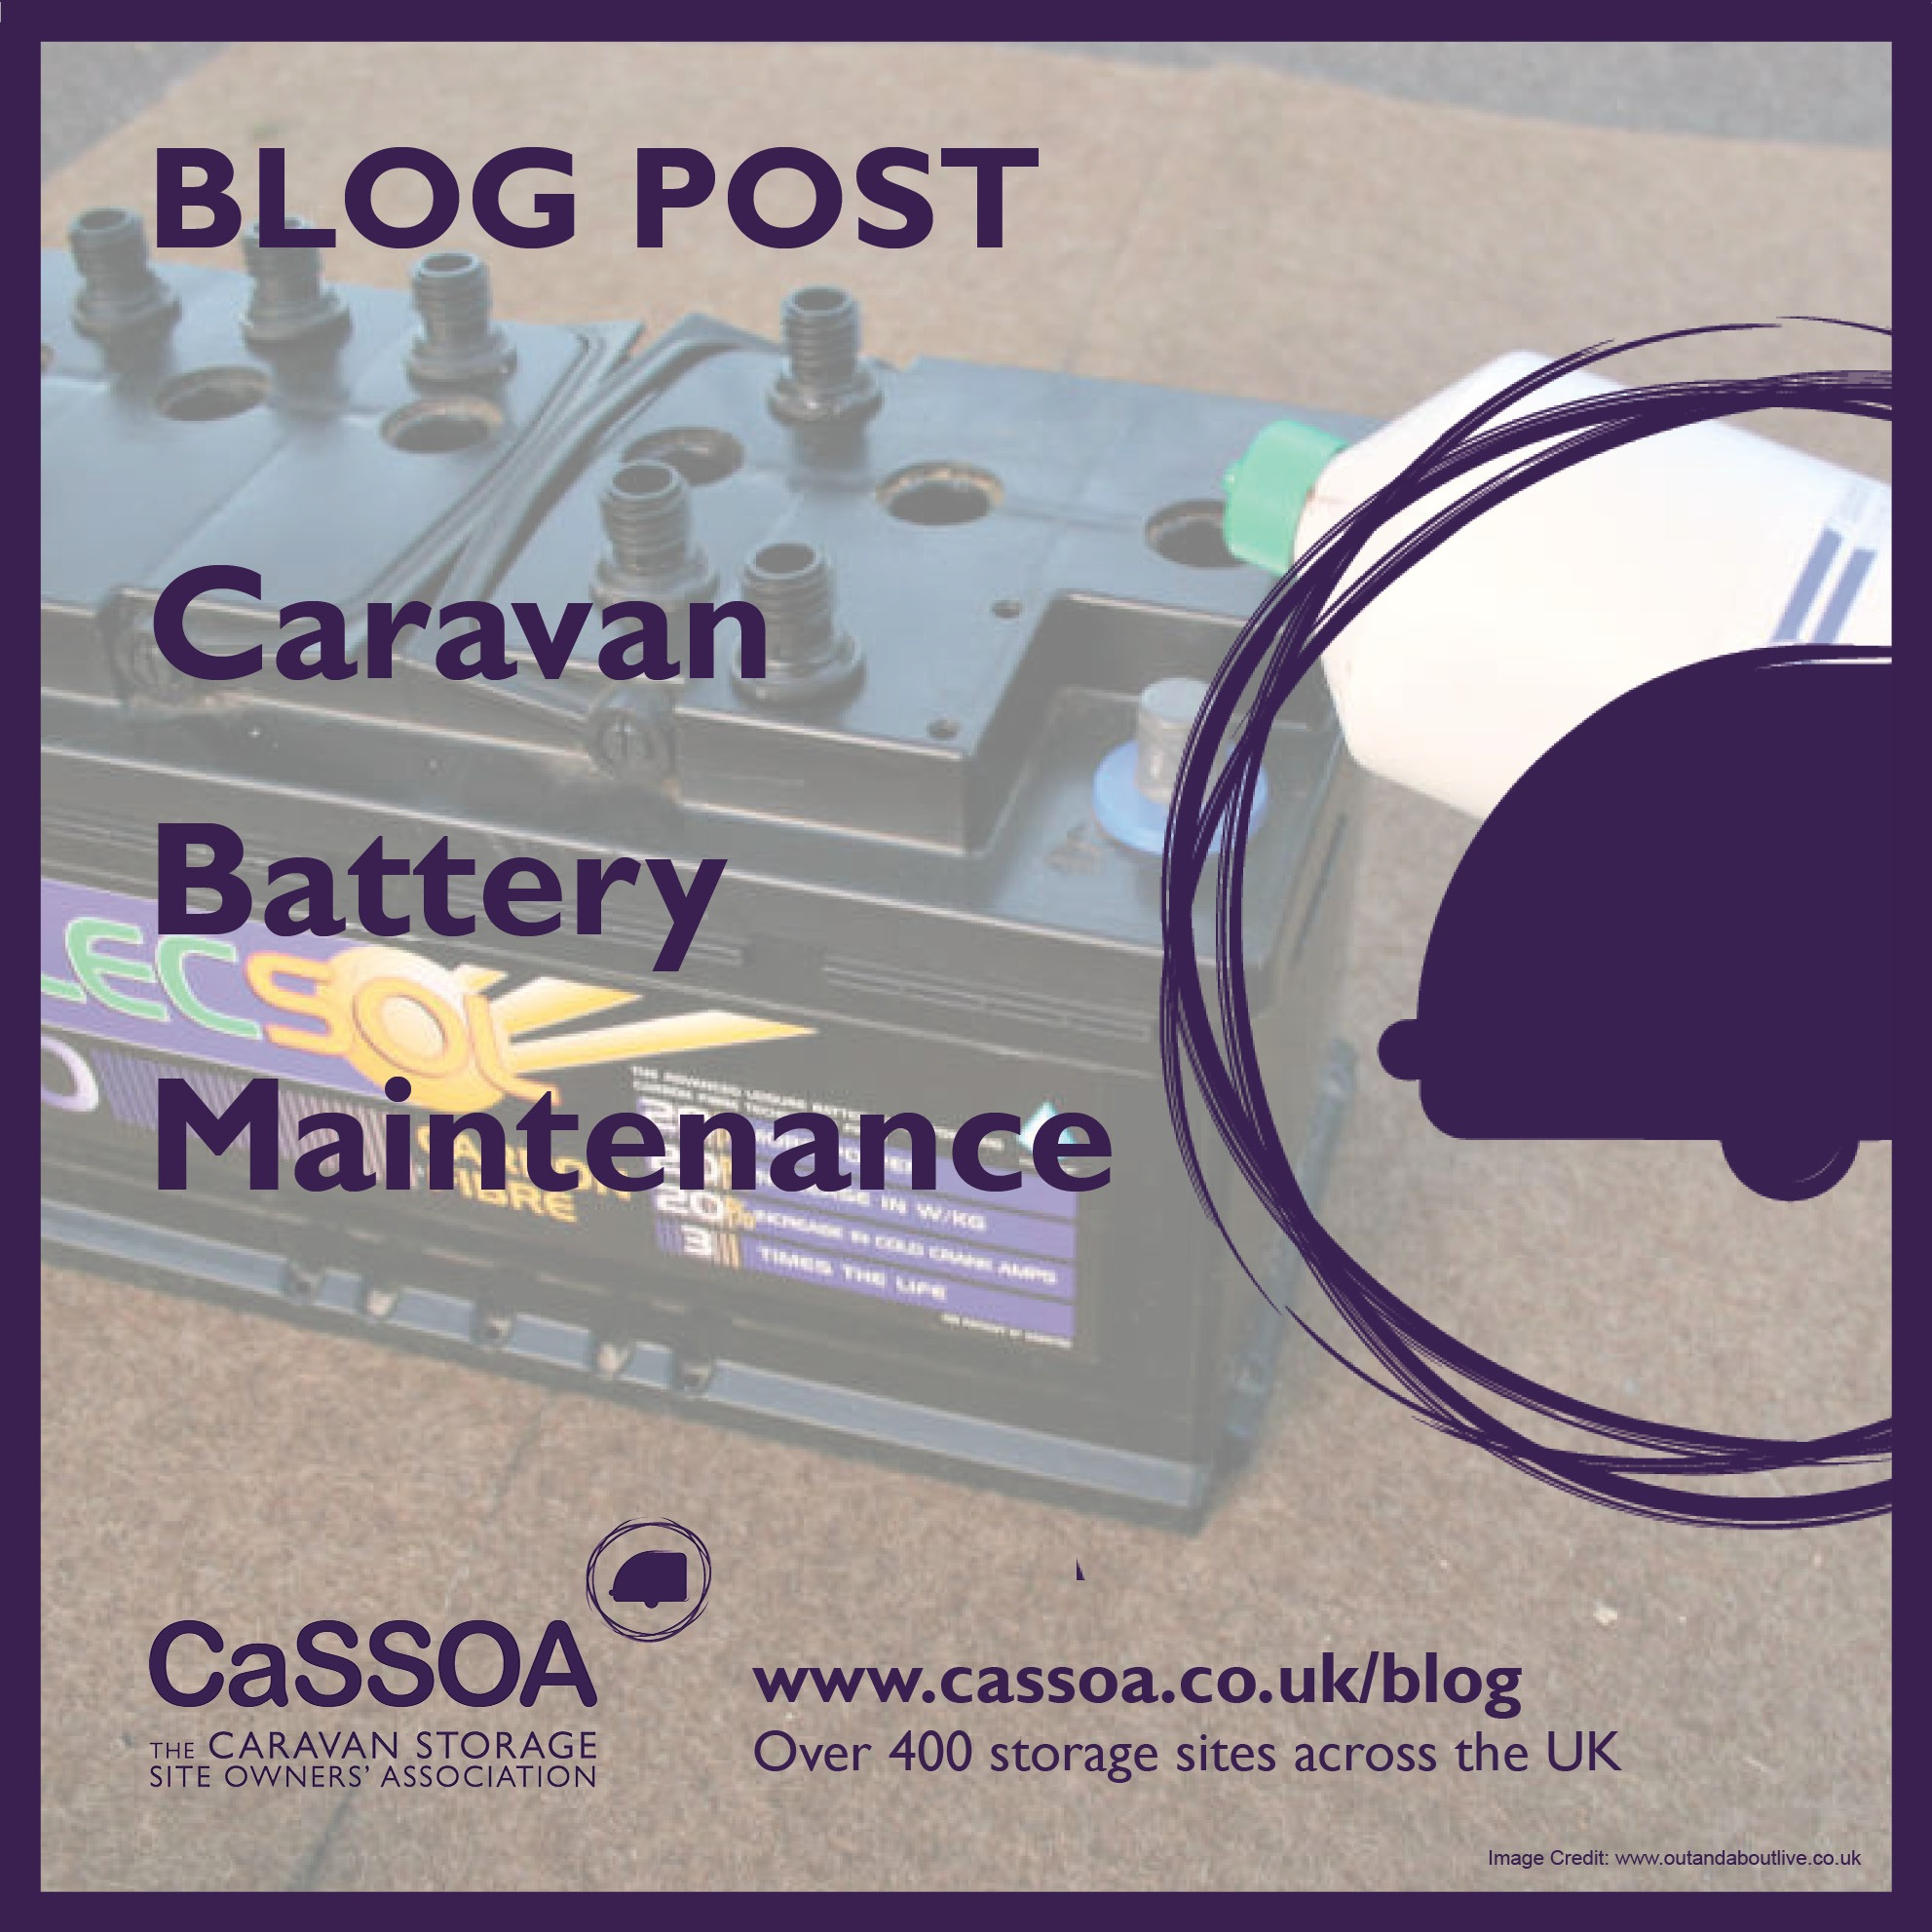 Caravan Battery Maintenance